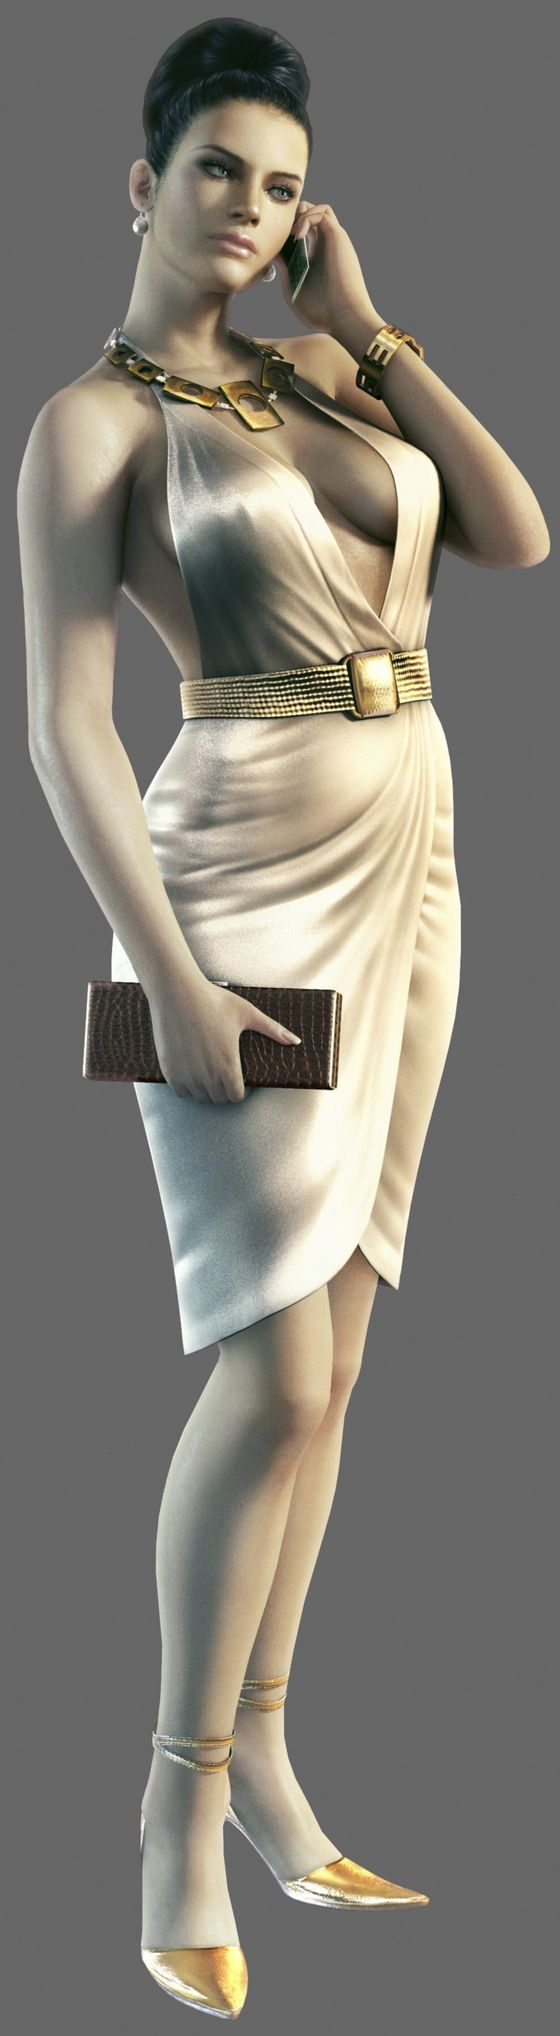 favorite person to play as in mercenaries! Resident Evil 5